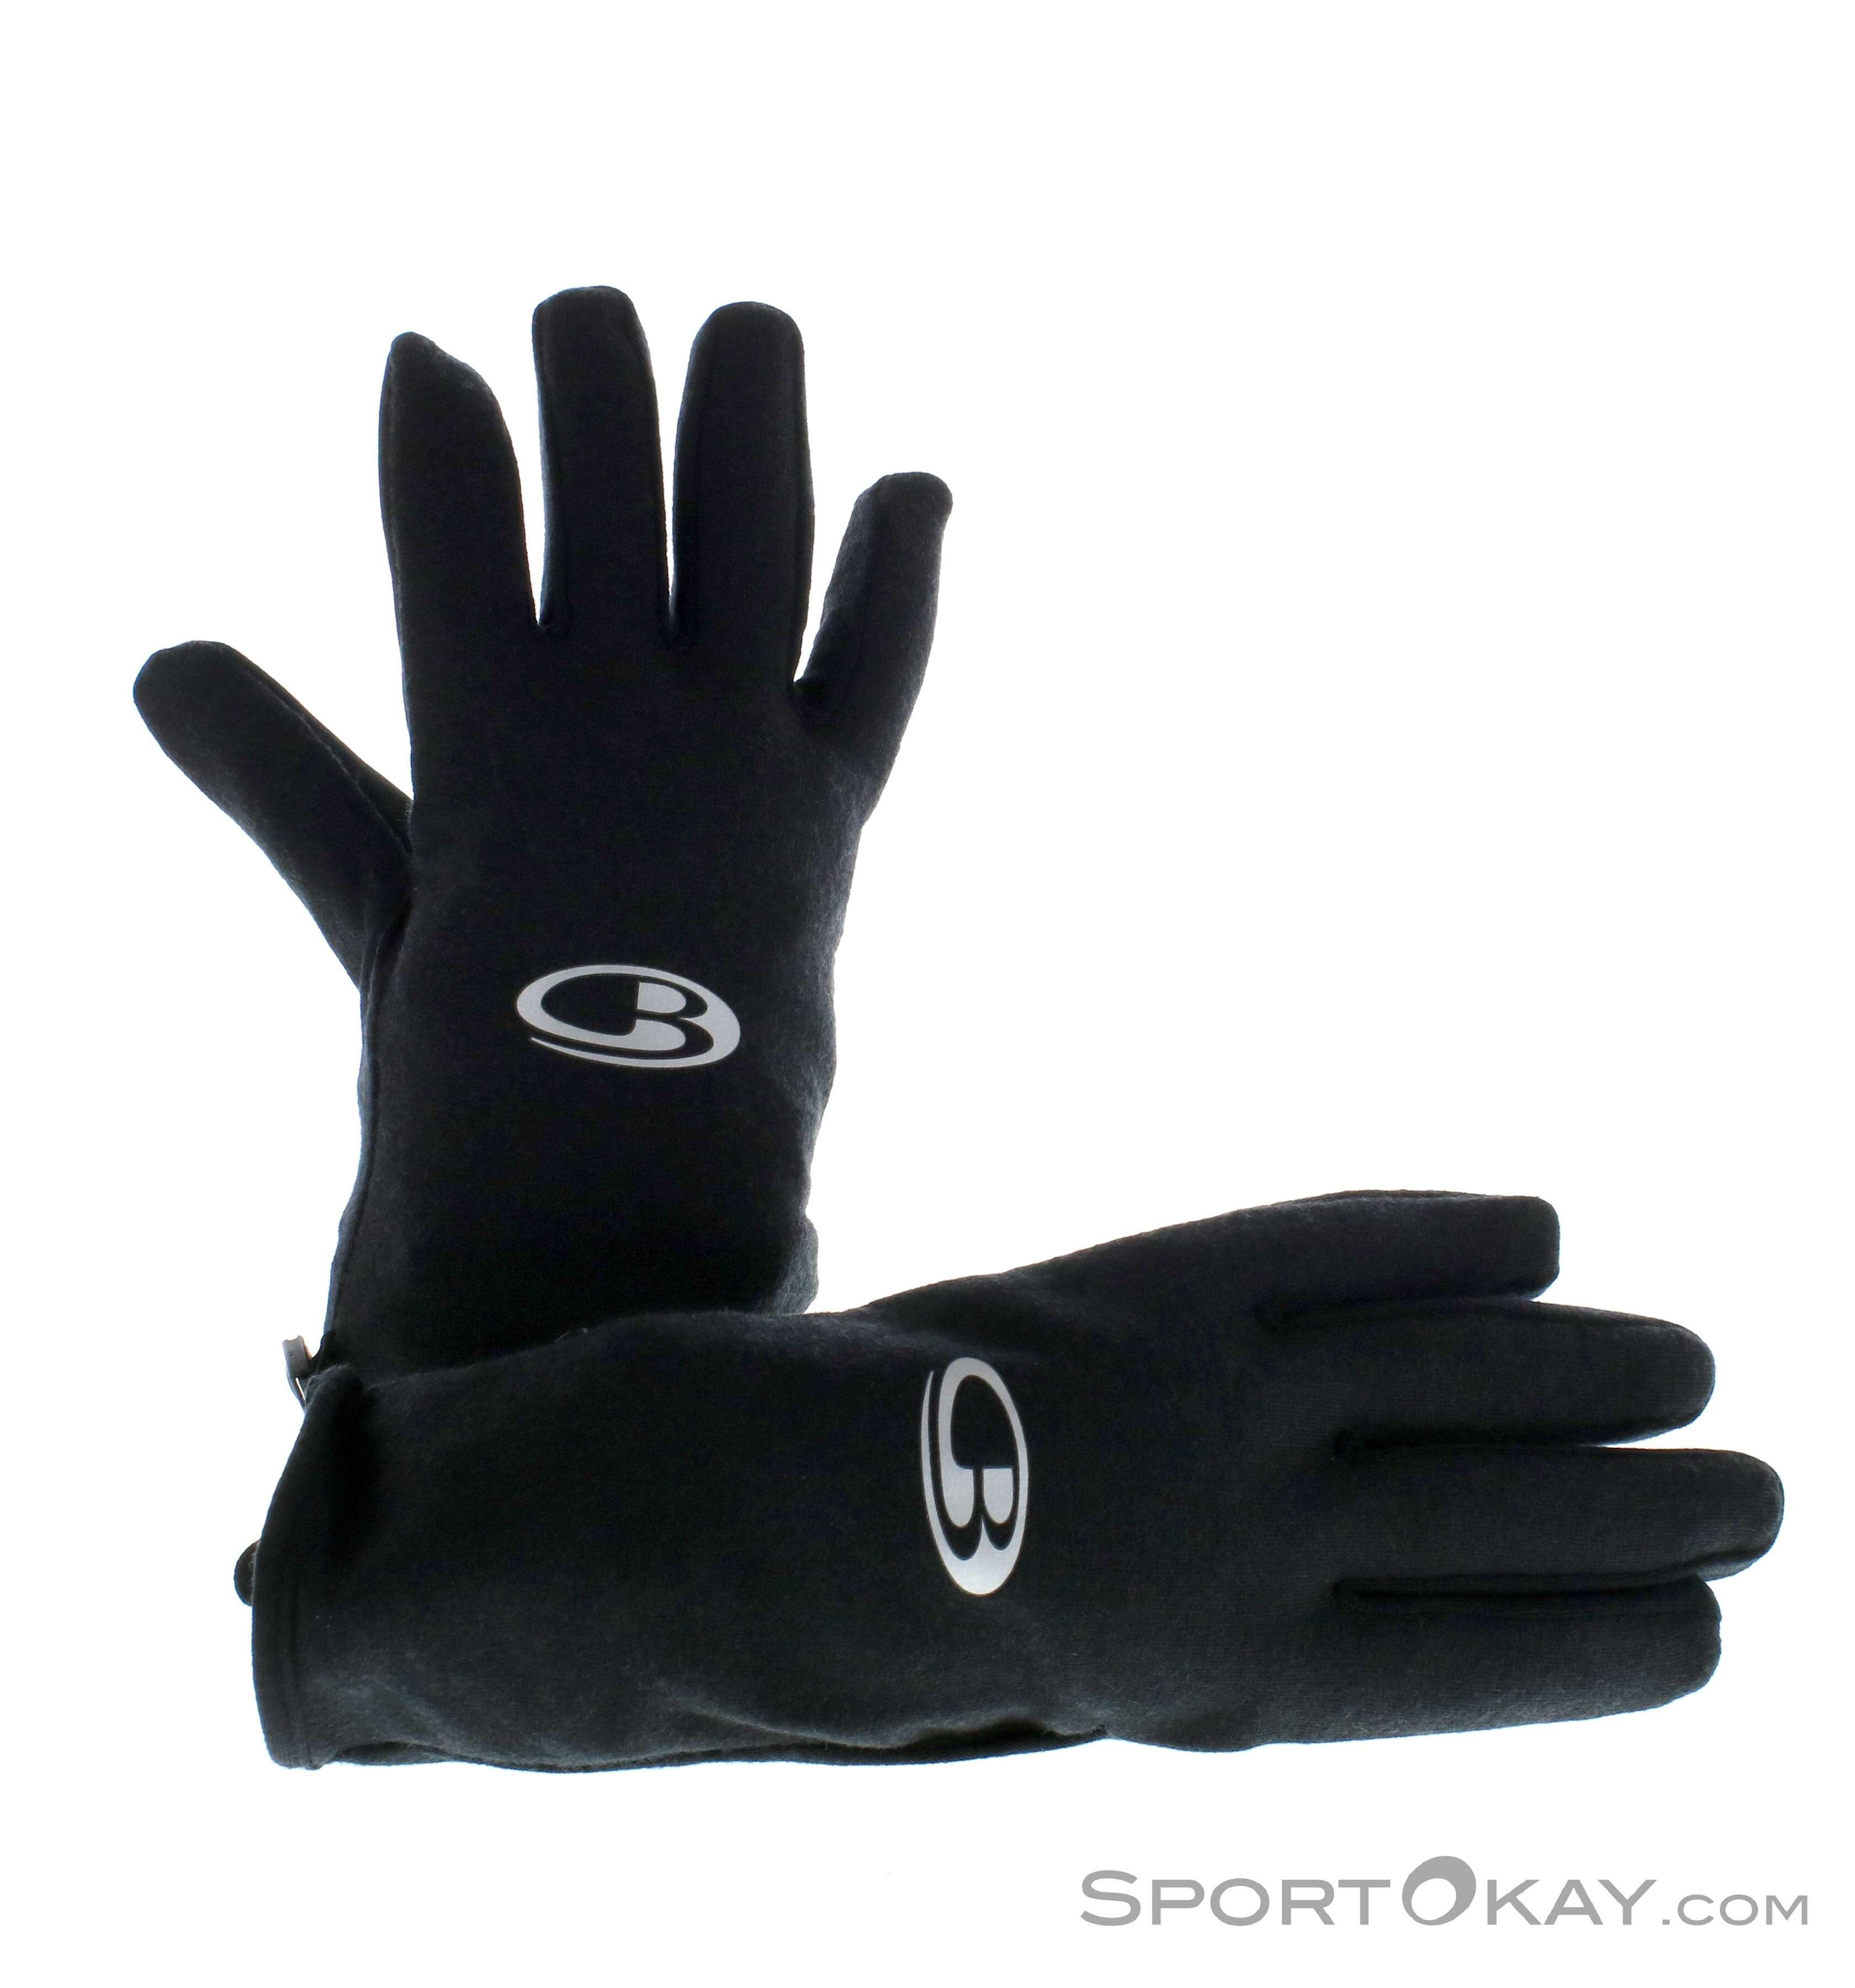 84ad2f5d7b Icebreaker Quantum Gloves, Icebreaker, Black, , Unisex, 0011-10080,  5637510220